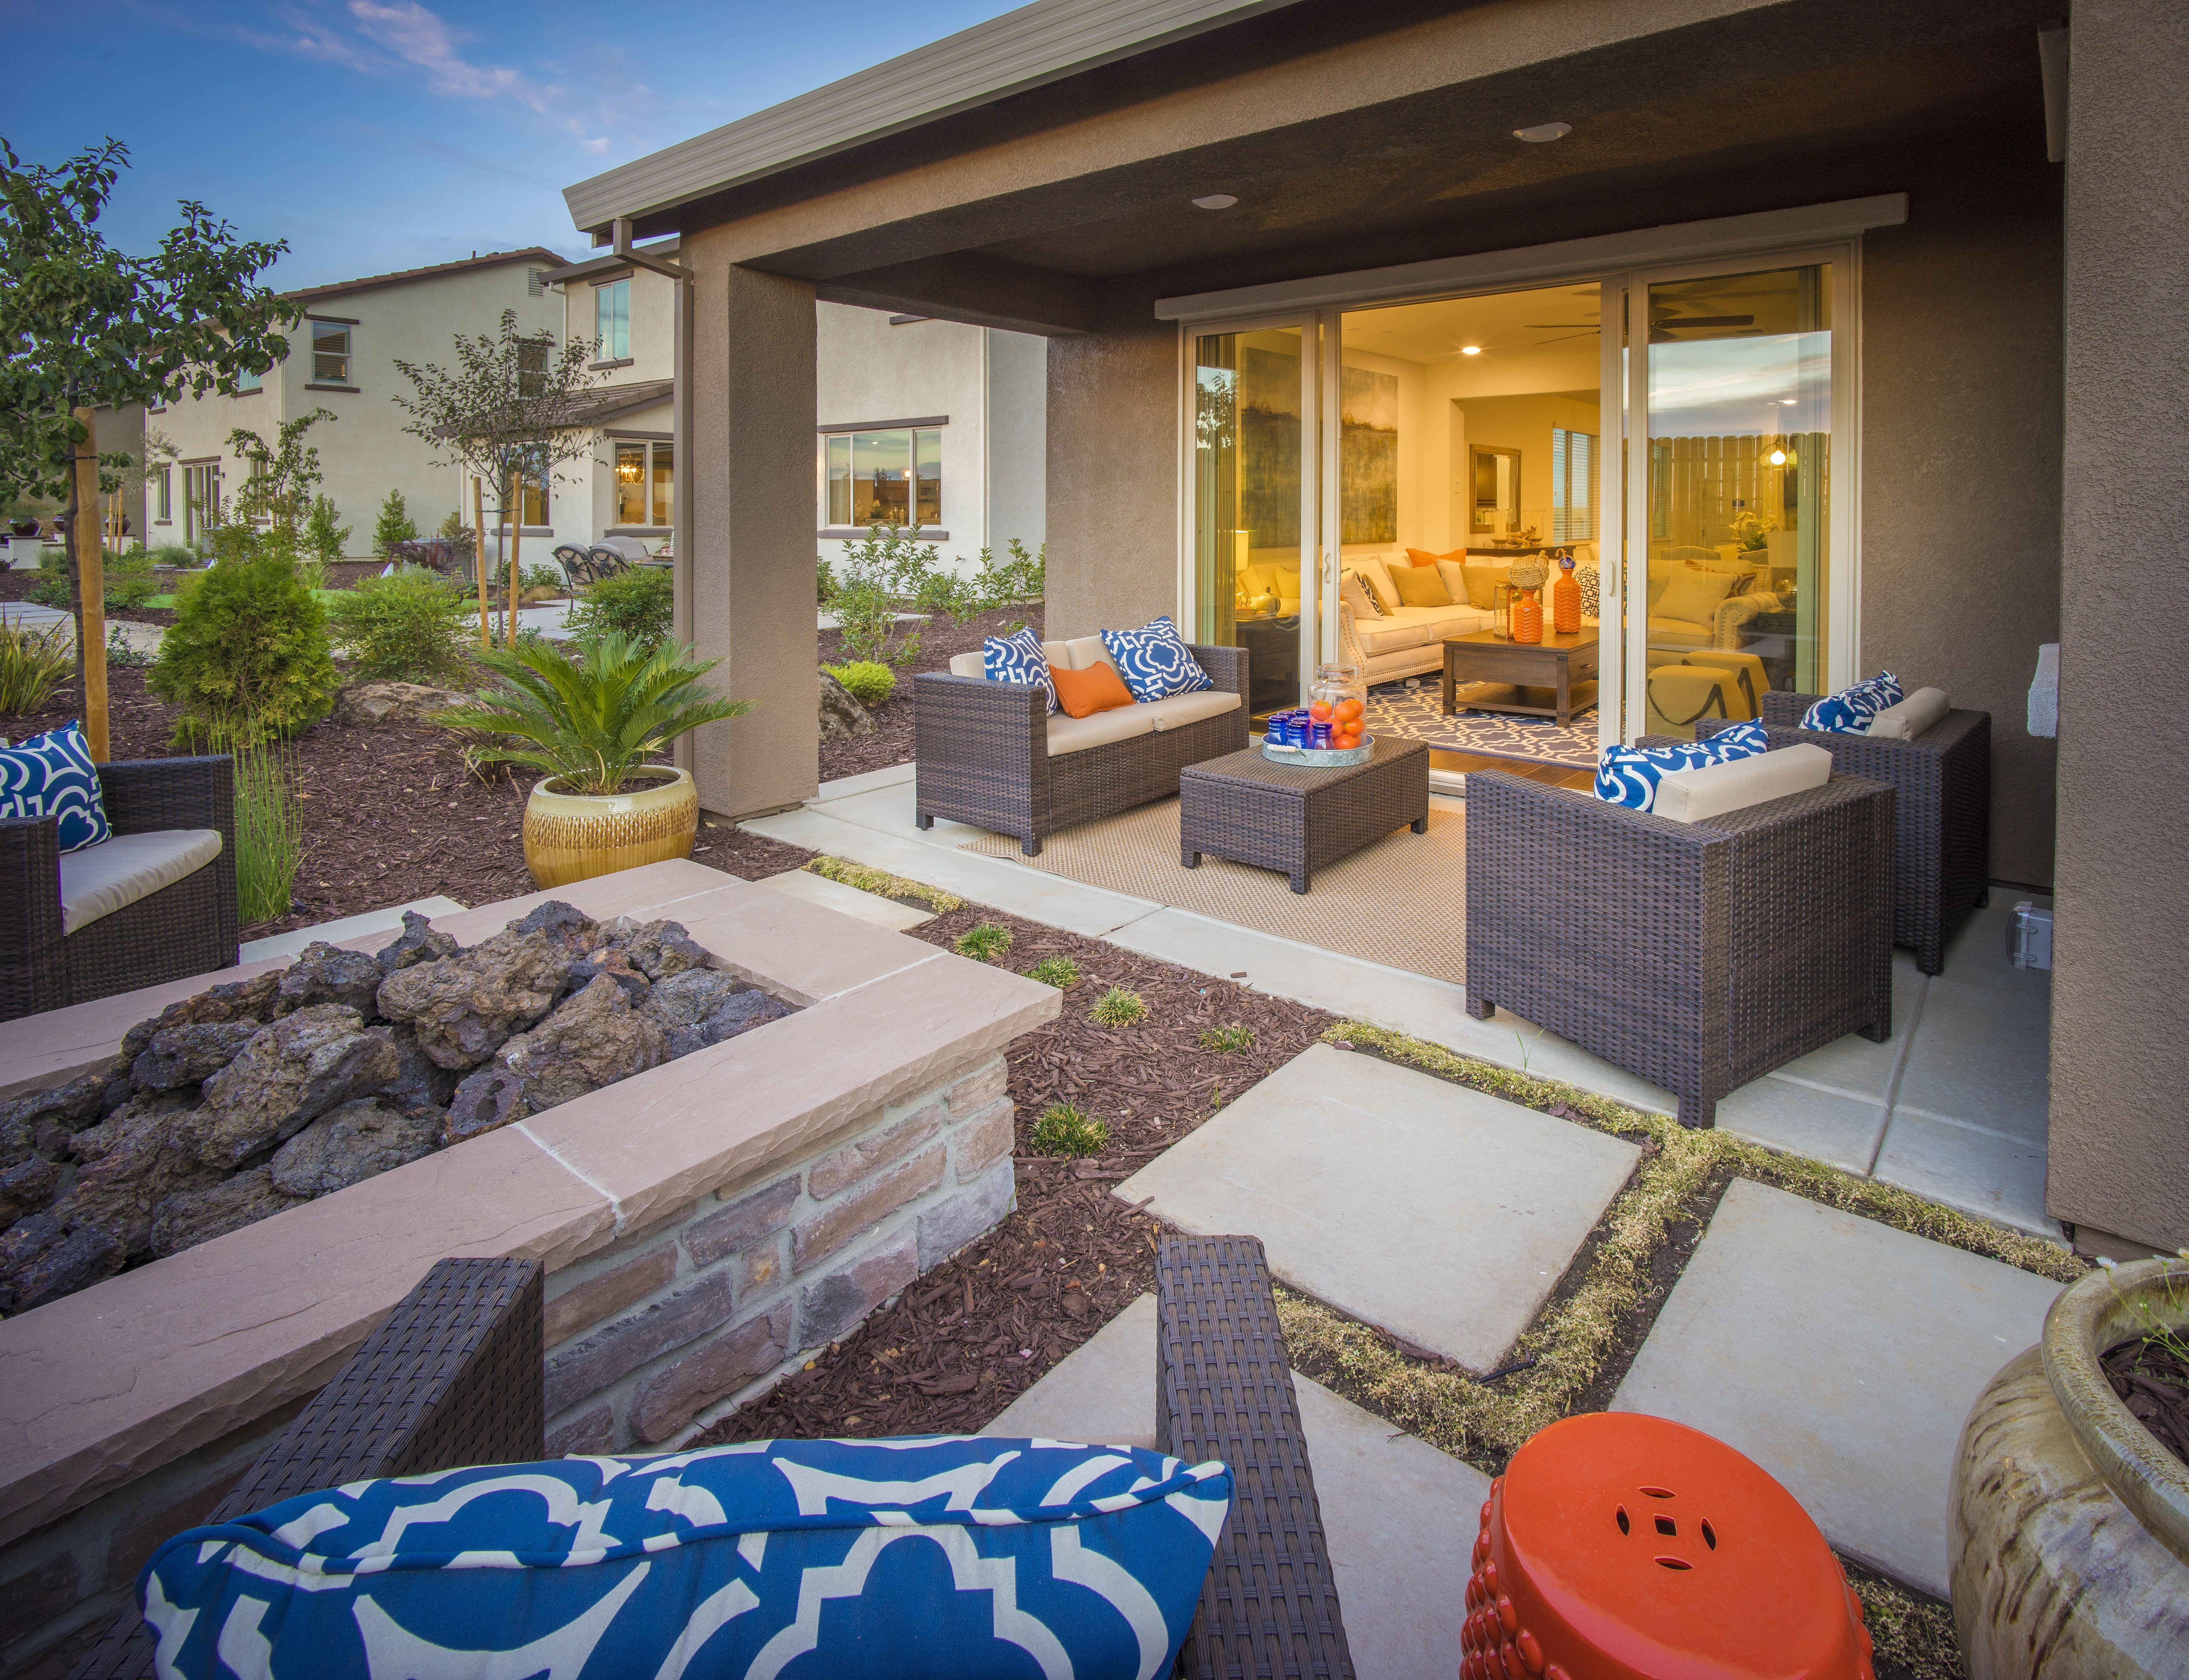 how do you like this backyard space architecture backyard